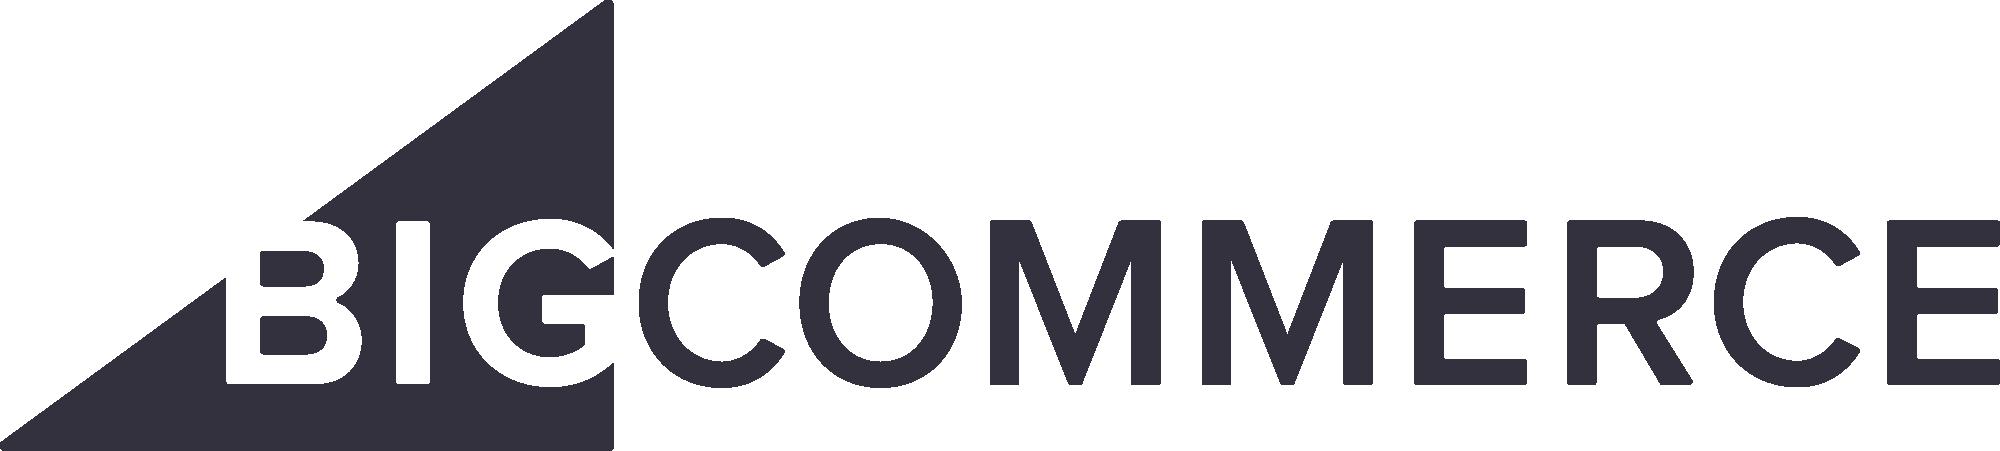 bigcommerce-revolver-image